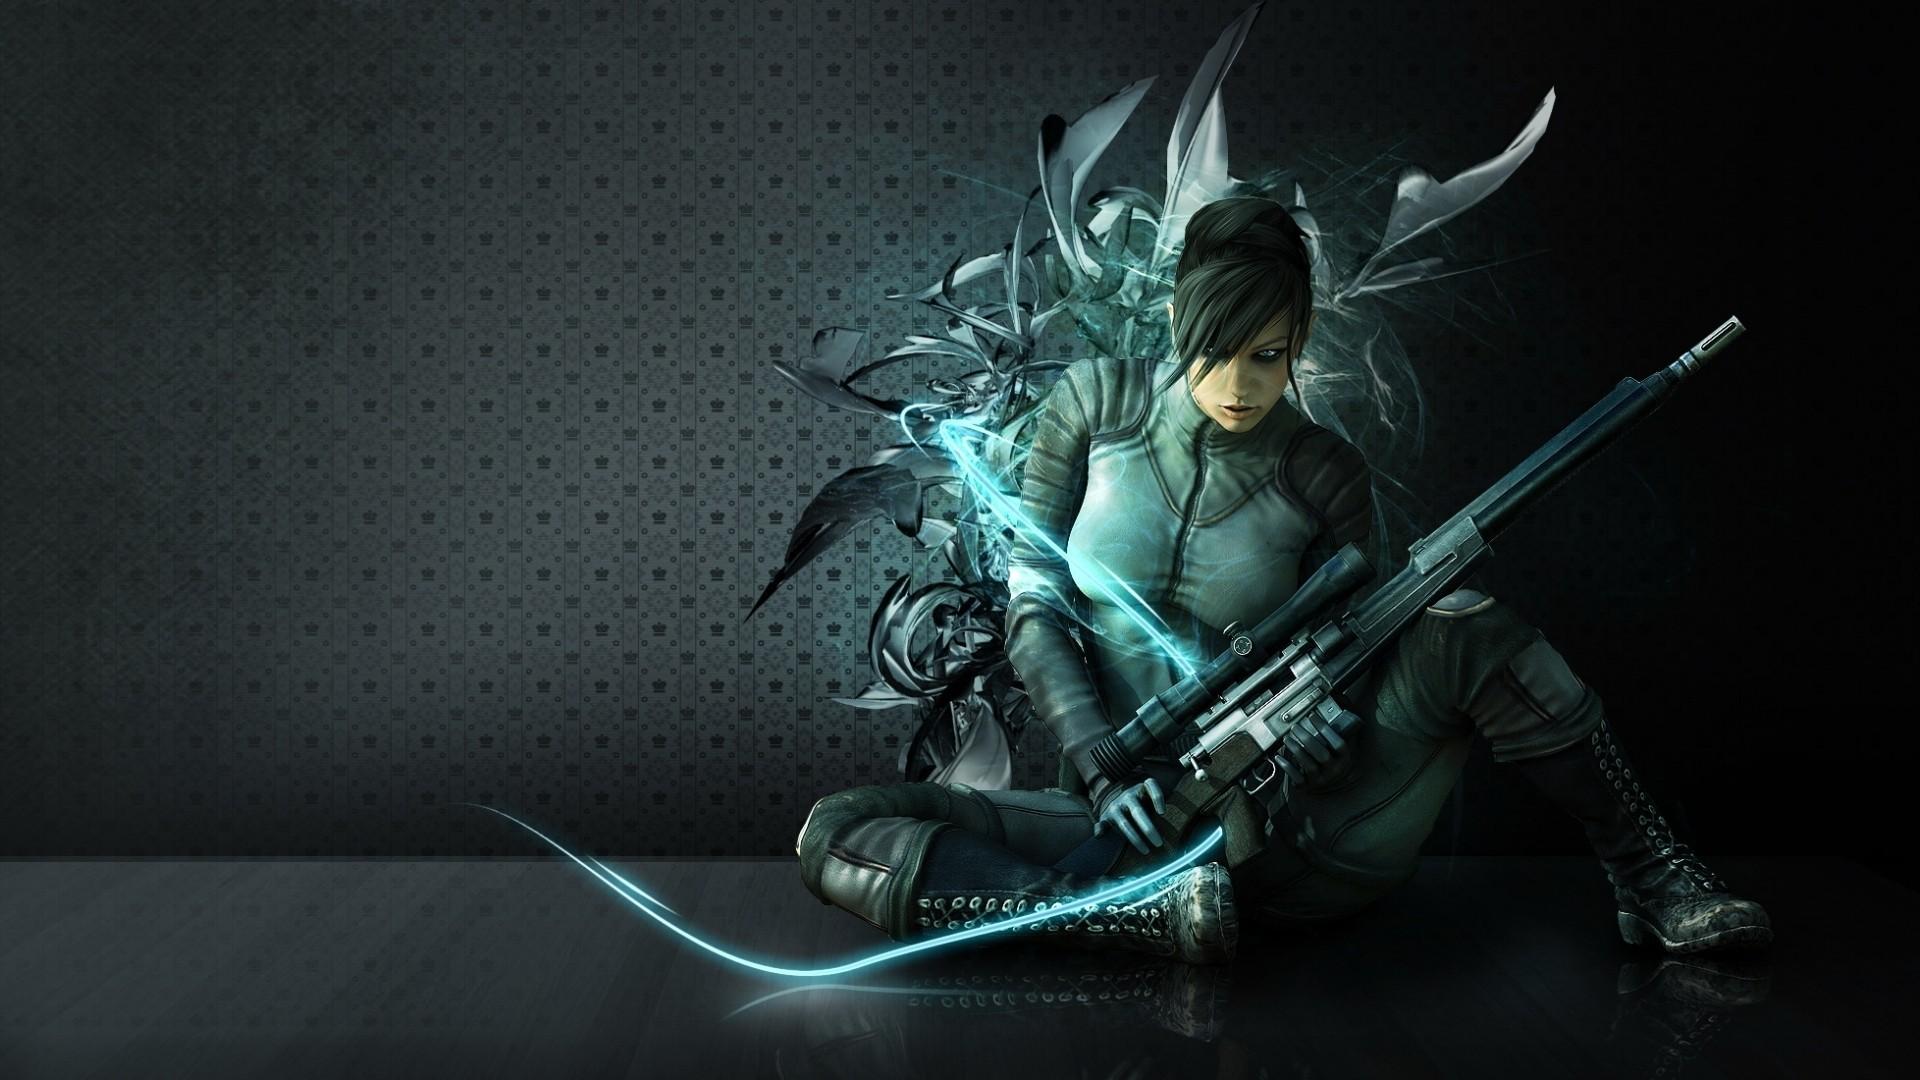 Anime Sniper Images   Desktop HD wallpaper. Stock photos HD quality.